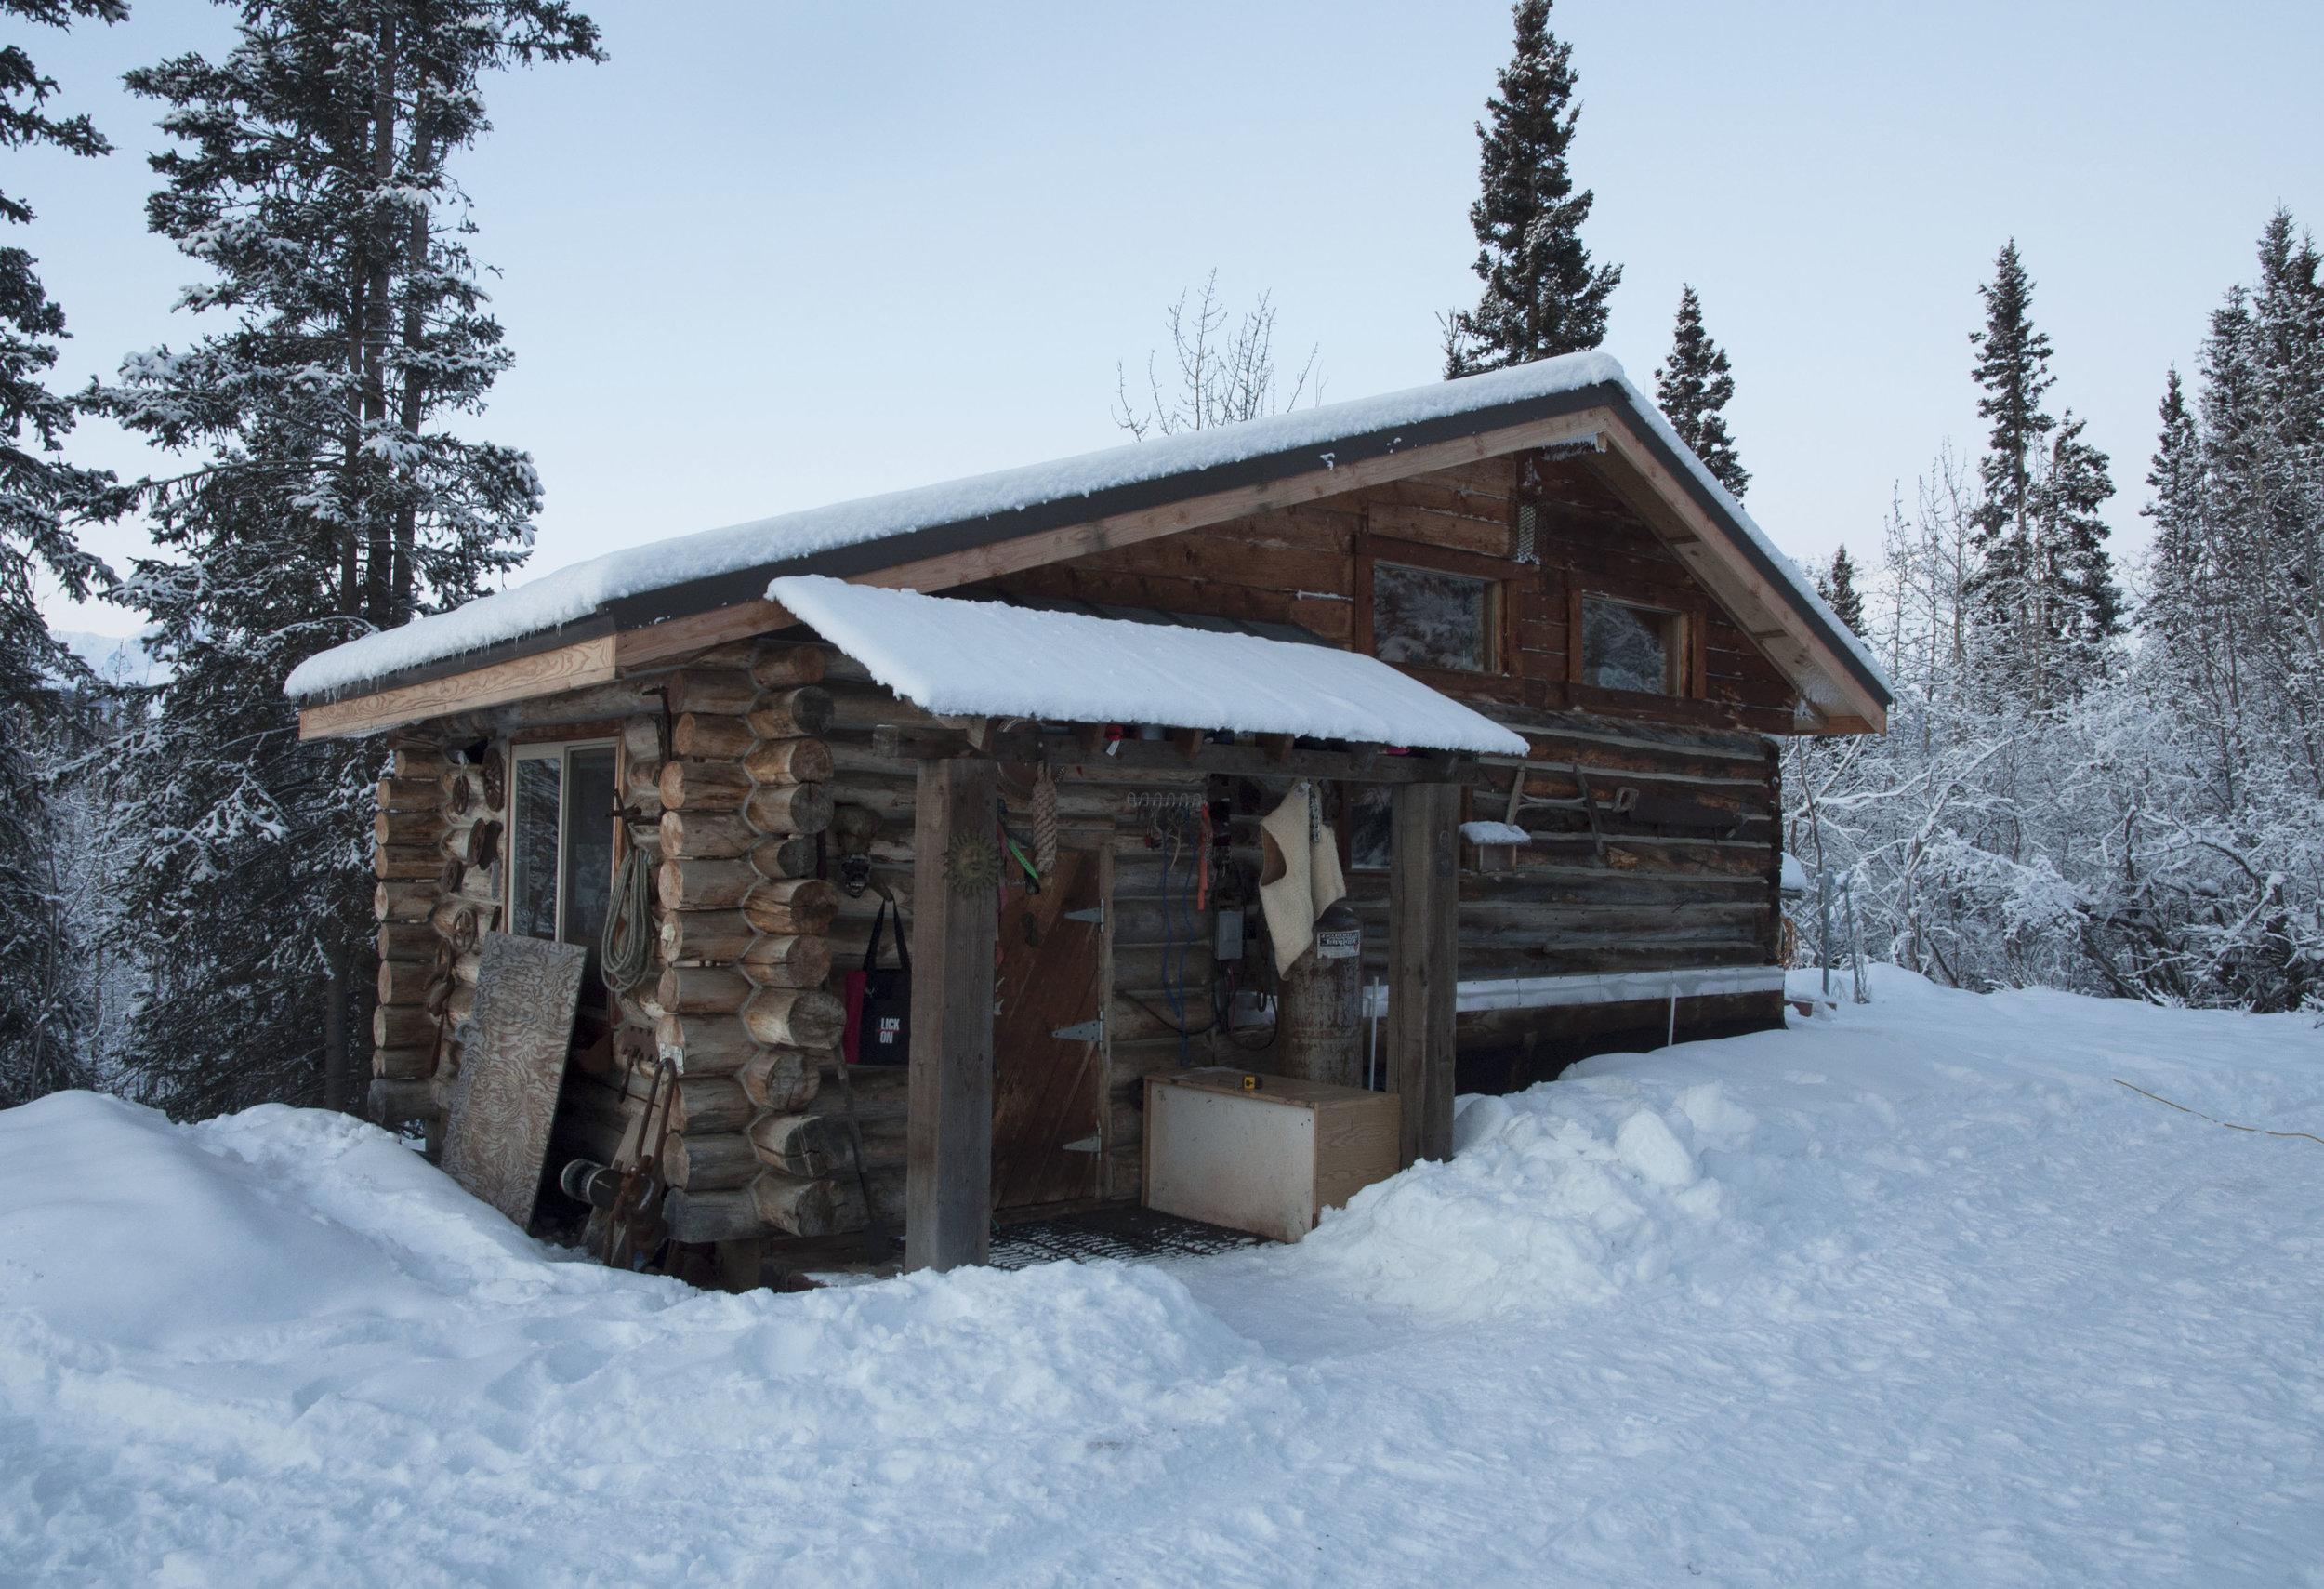 Malcolm Vance's log cabin